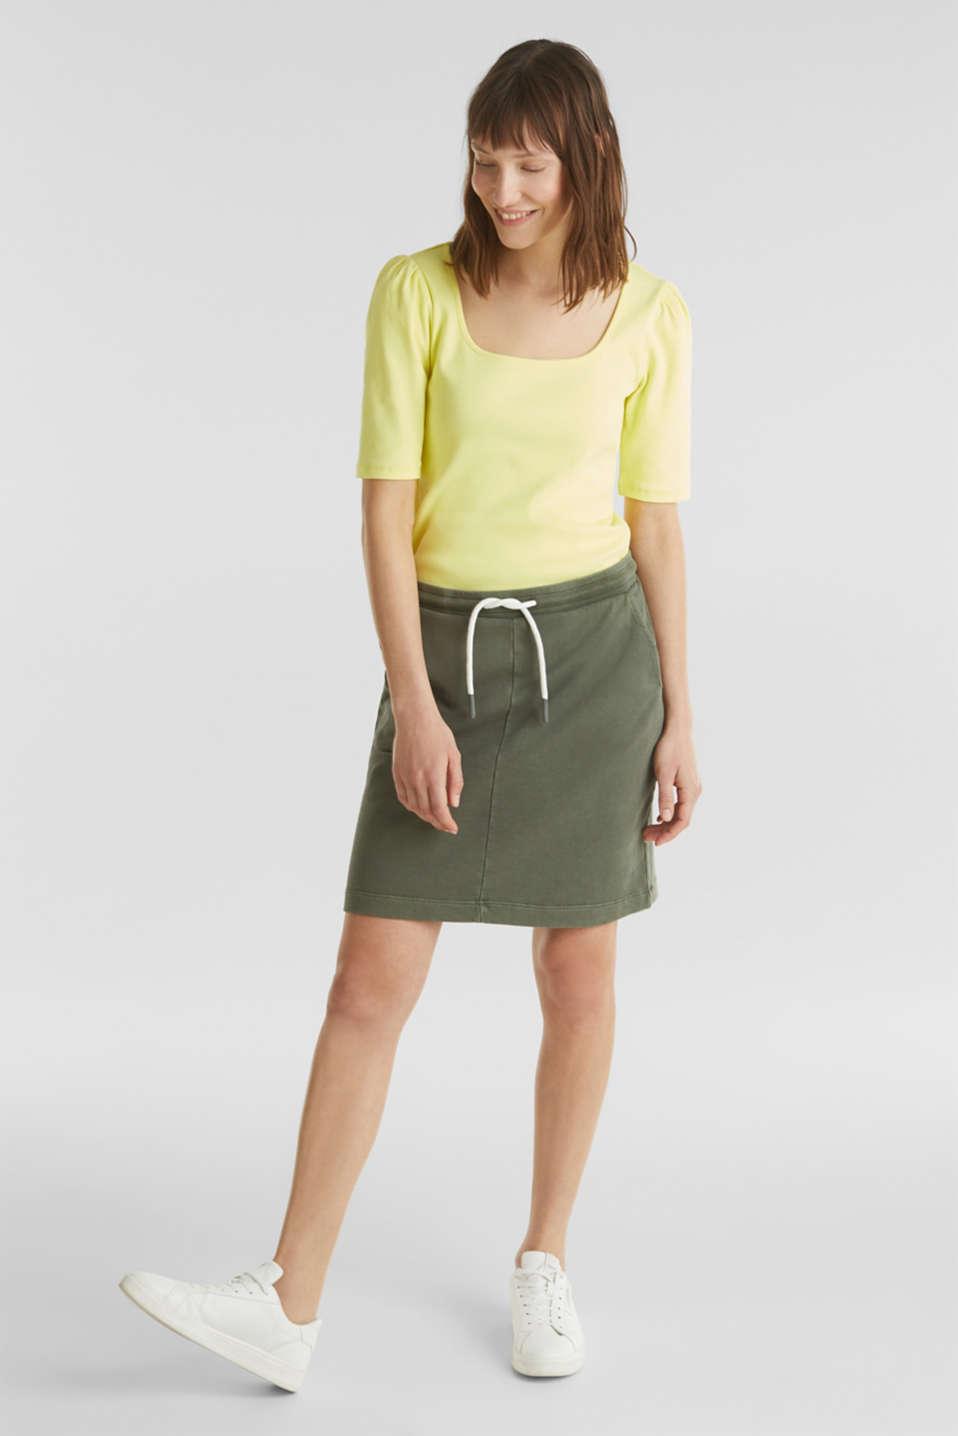 Sweatshirt fabric skirt, 100% cotton, KHAKI GREEN, detail image number 1